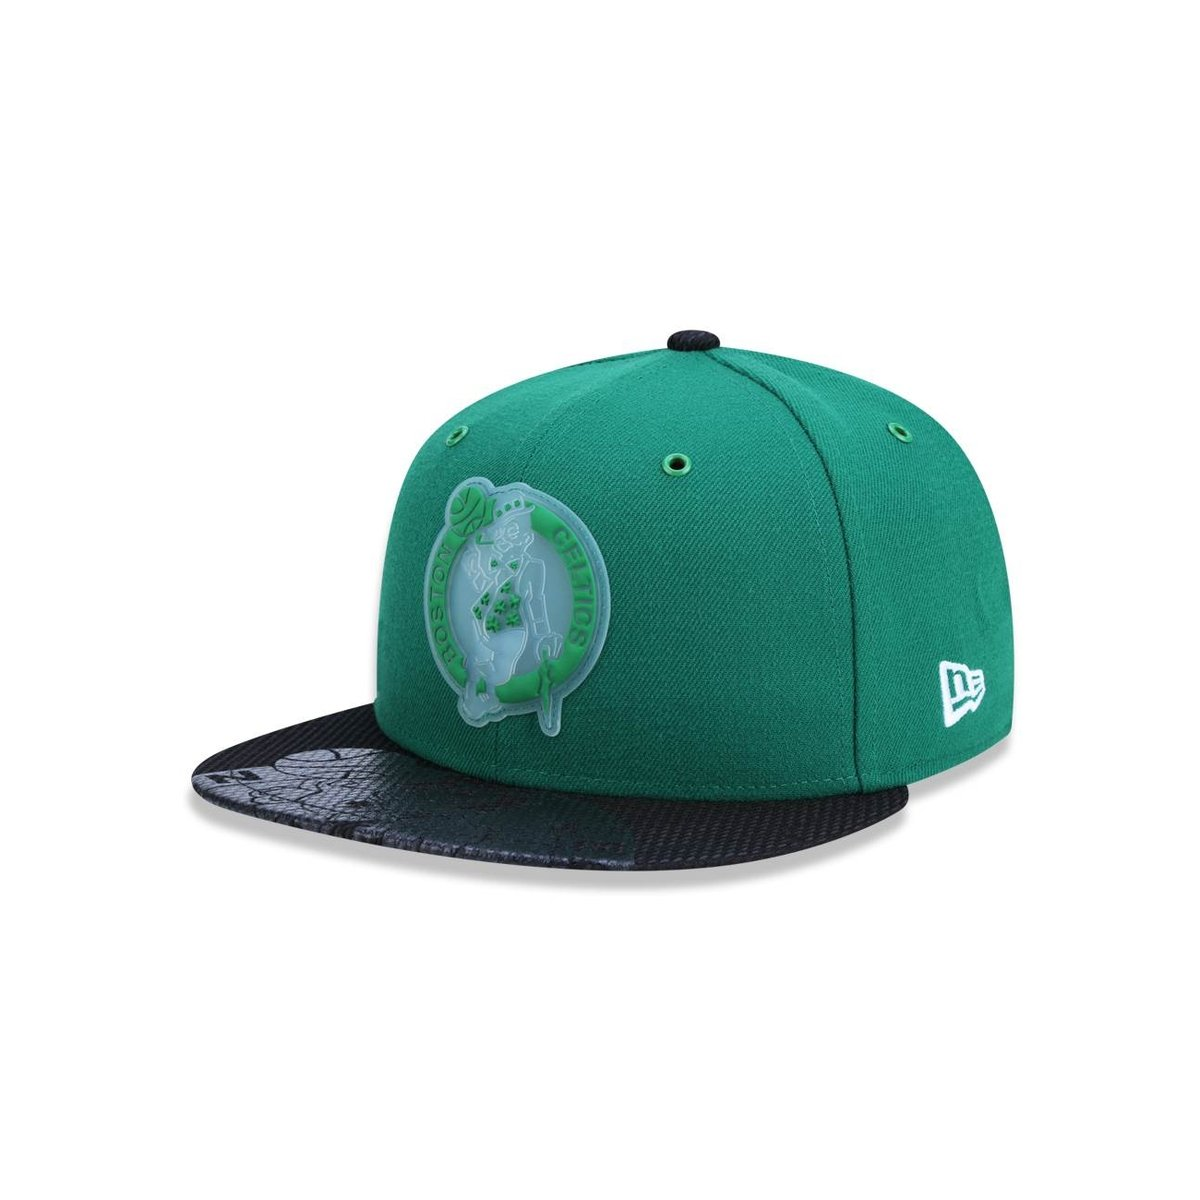 Boné 950 Boston Celtics NBA Aba Reta New Era - Compre Agora  c1e1fbd3b77